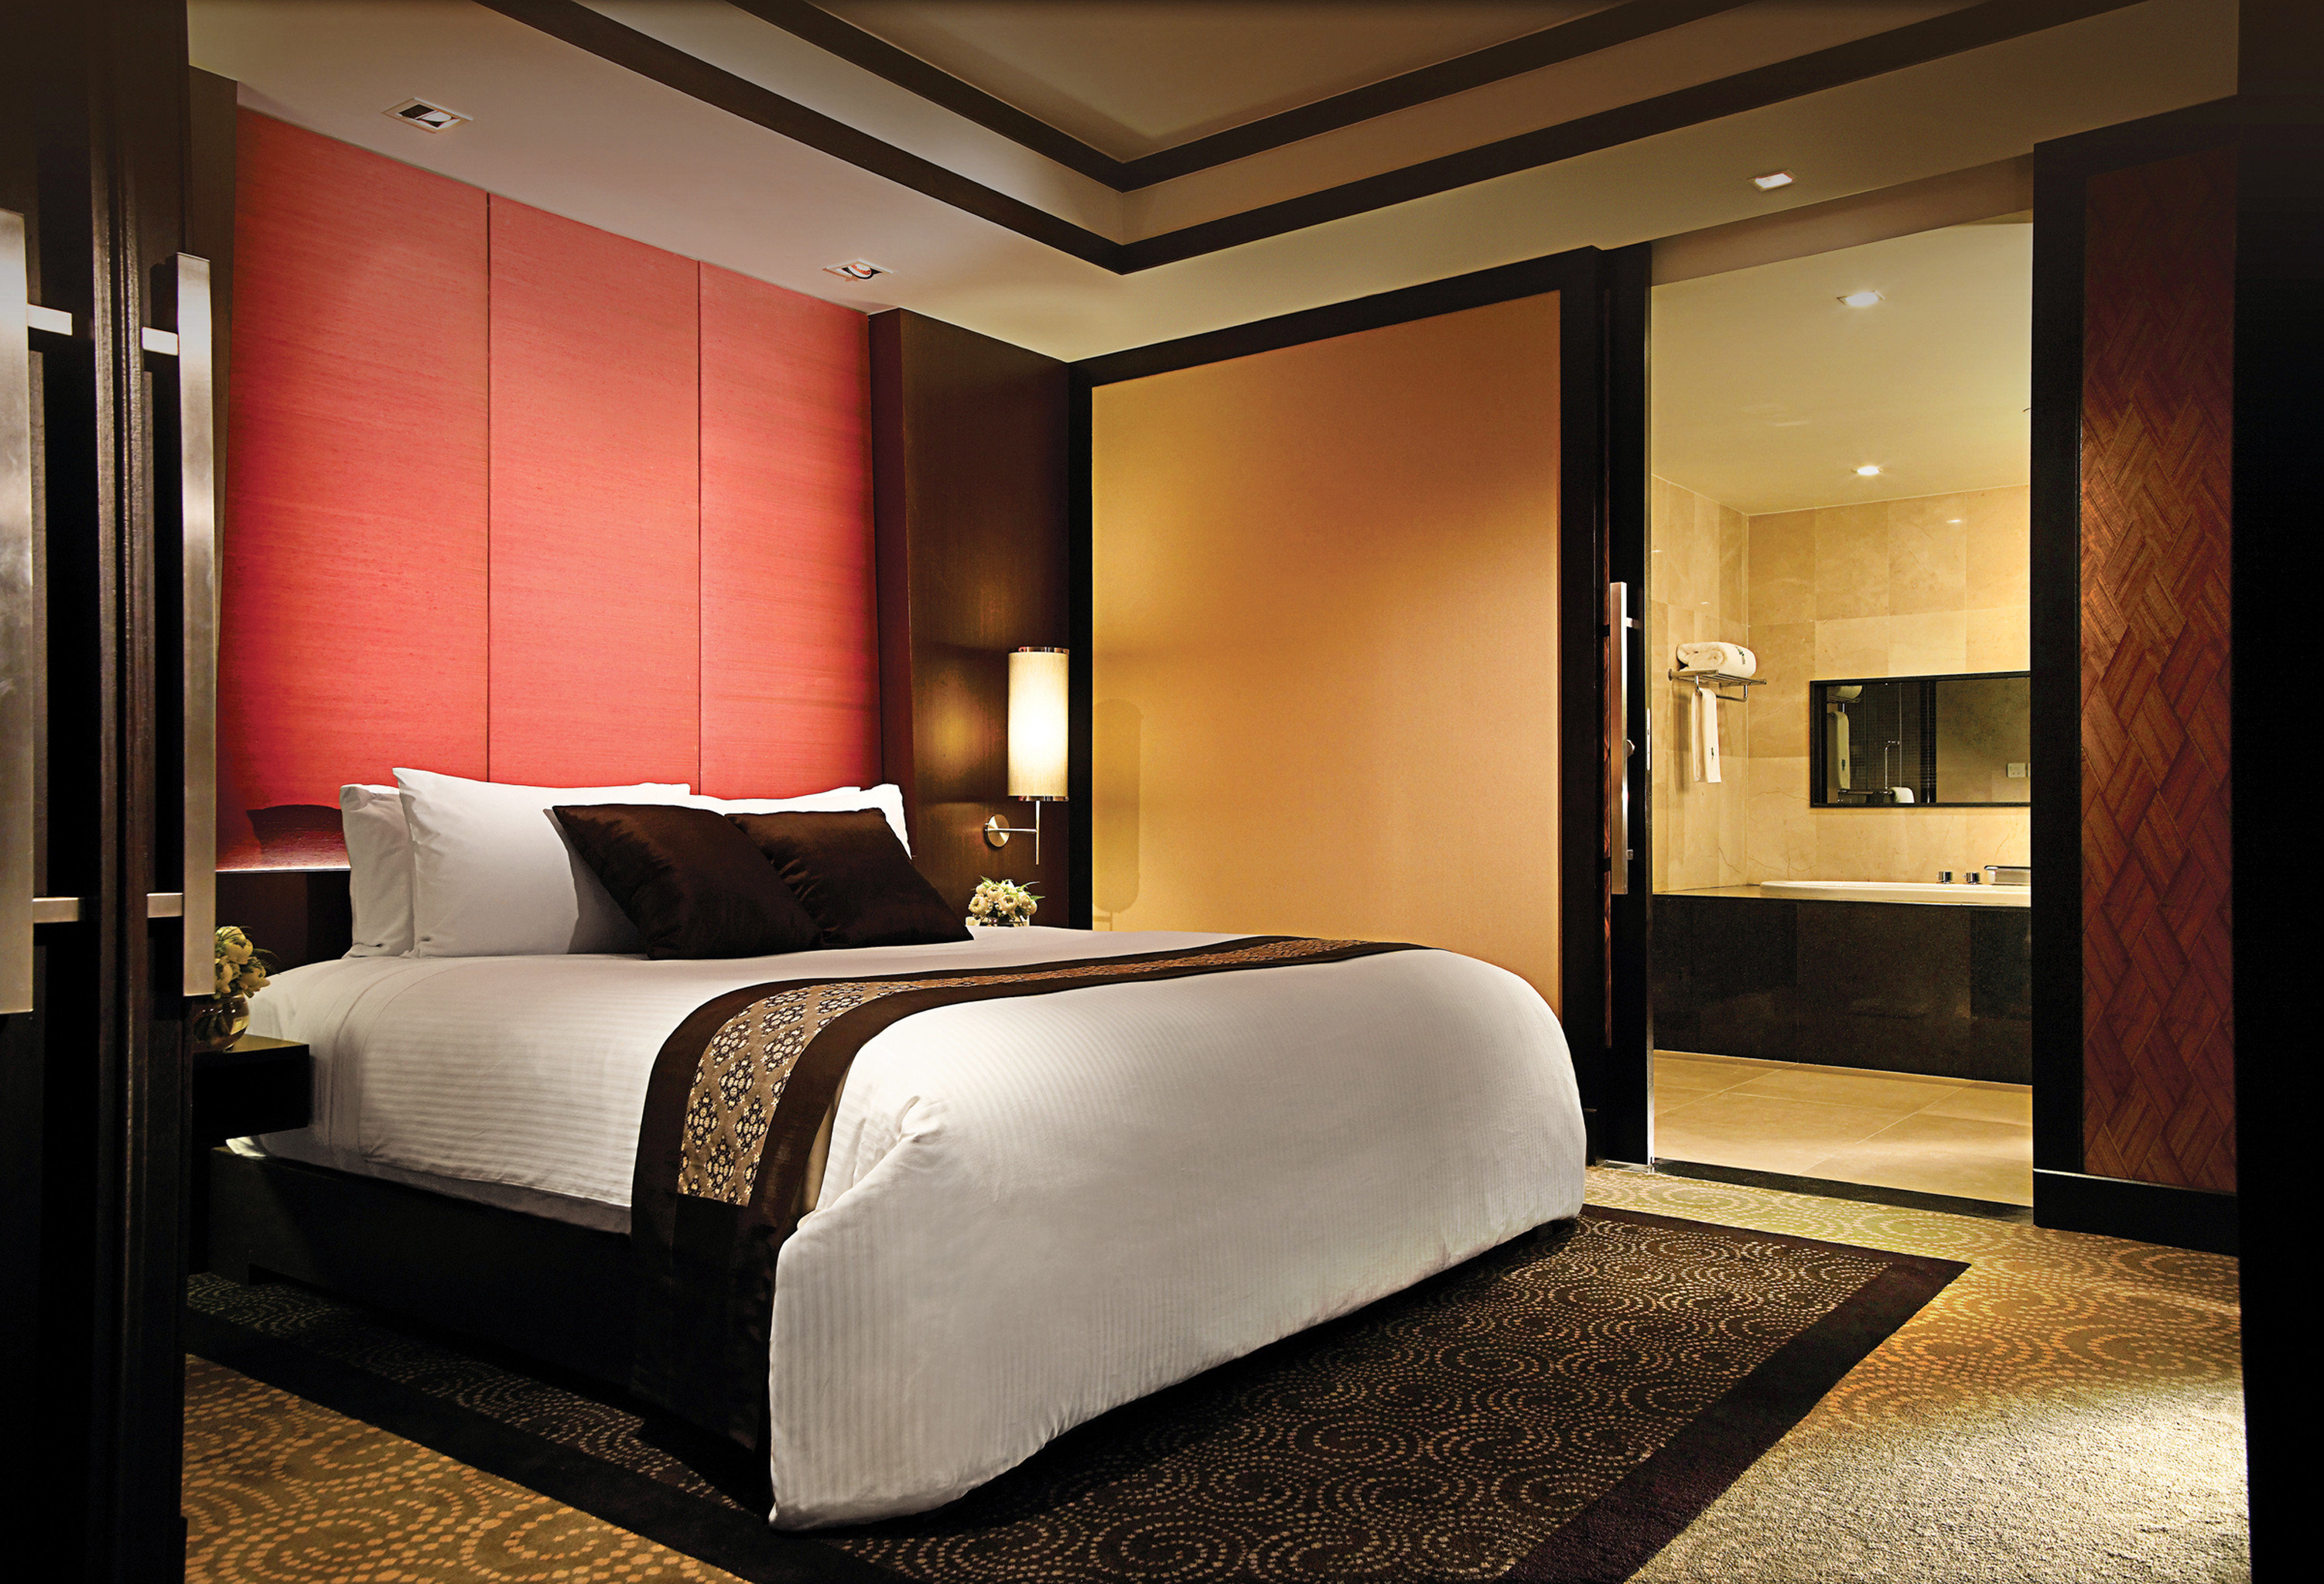 Bedroom Luxury Modern Scenic views Suite property home living room lamp night